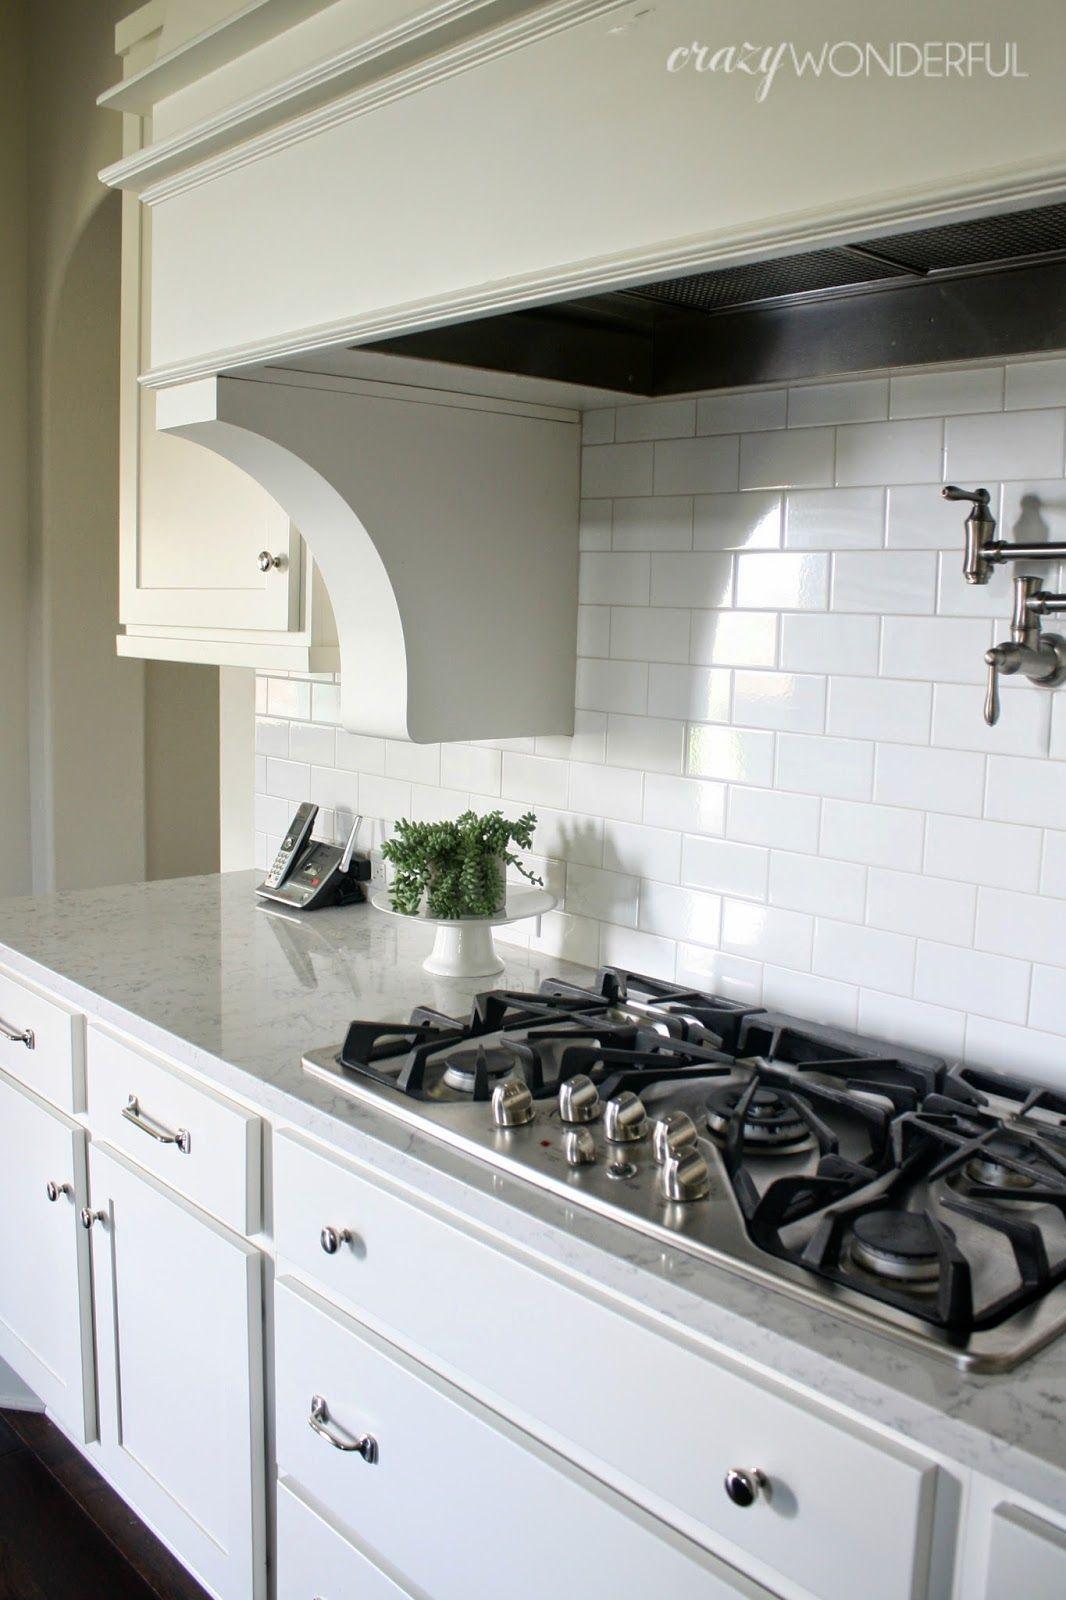 White Cabinets Kitchen Subway Tile Pot Filler Lyra Silestone